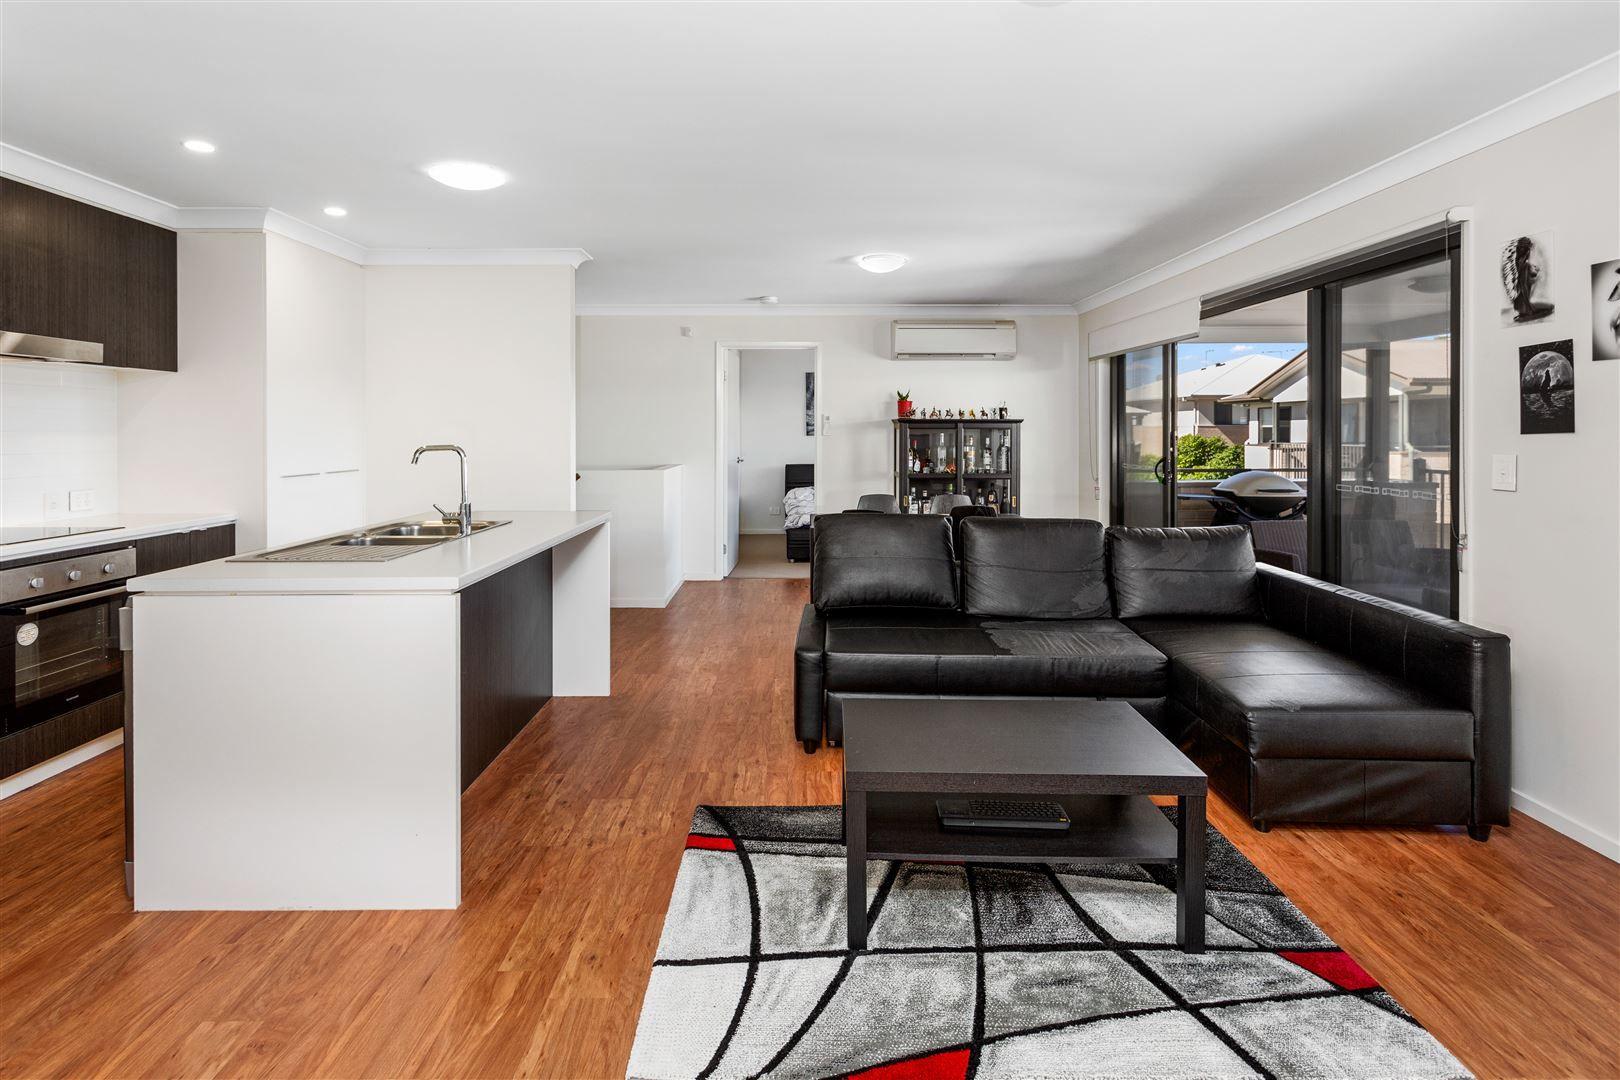 214/25 Farinazzo Street, Richlands QLD 4077, Image 0